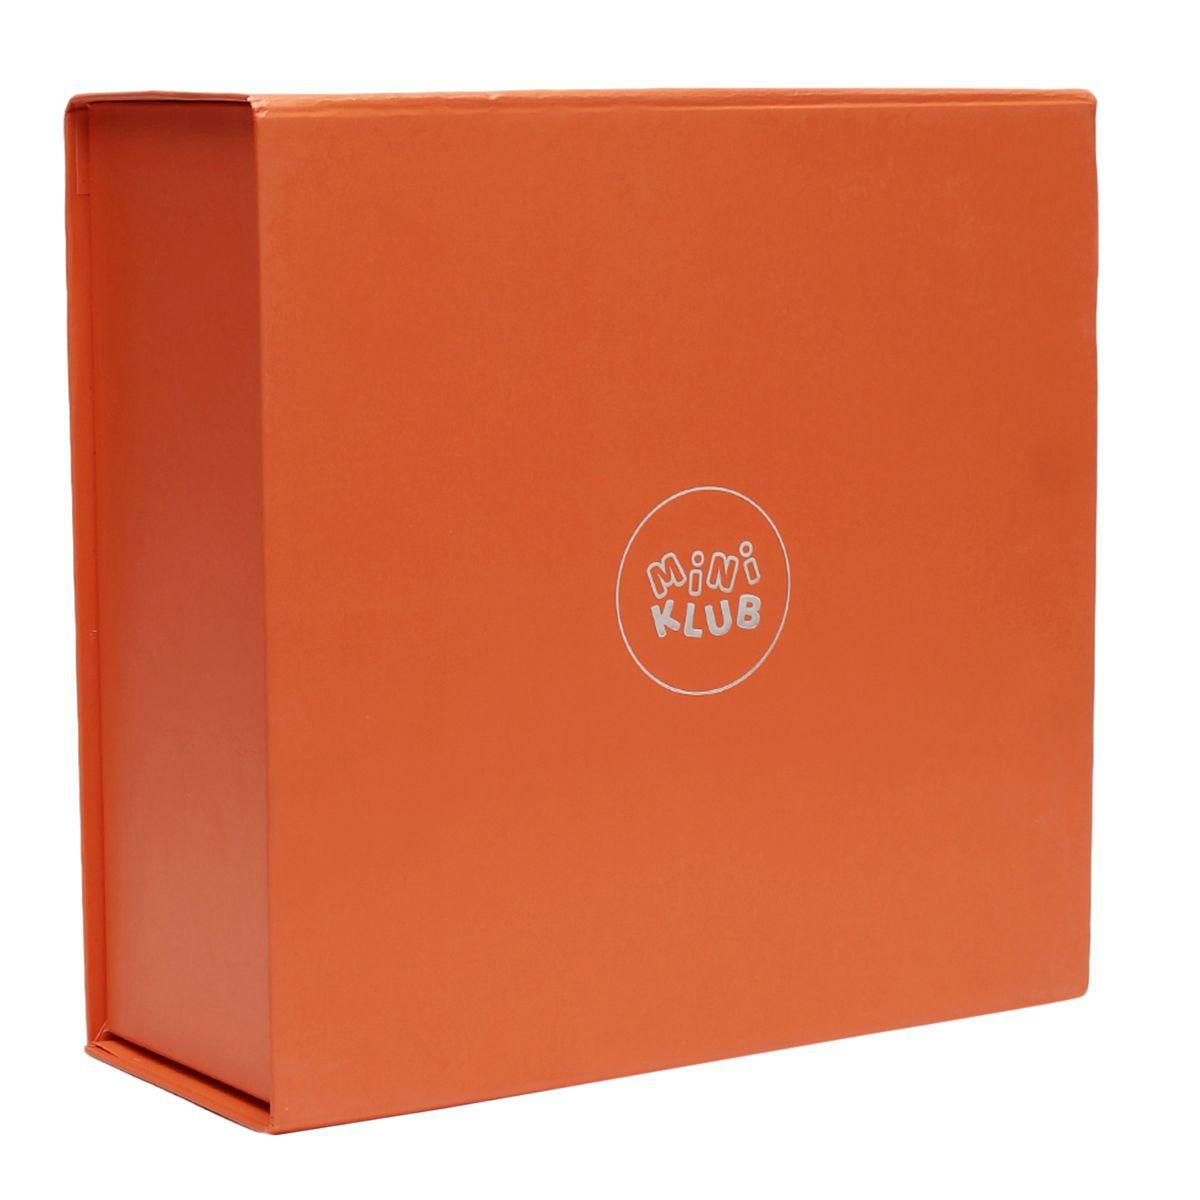 Miniklub Unisex Orange Printed Pack of a sleepsuit, a Hoodie, a milestone box & a Toy